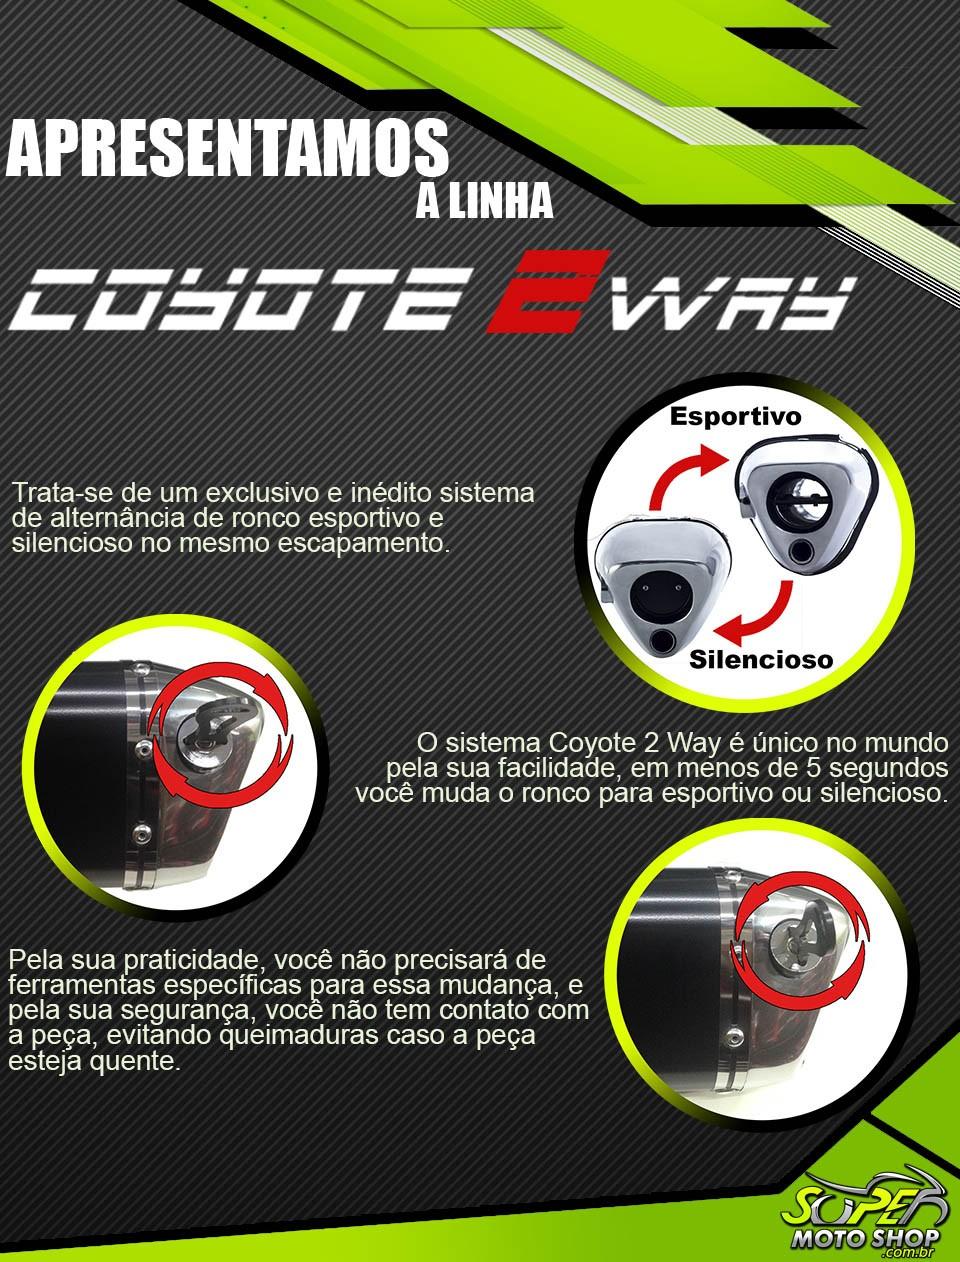 Escape / Ponteira Coyote TRS 2 Way Alumínio - Bandit 650 até 2008 - Suzuki